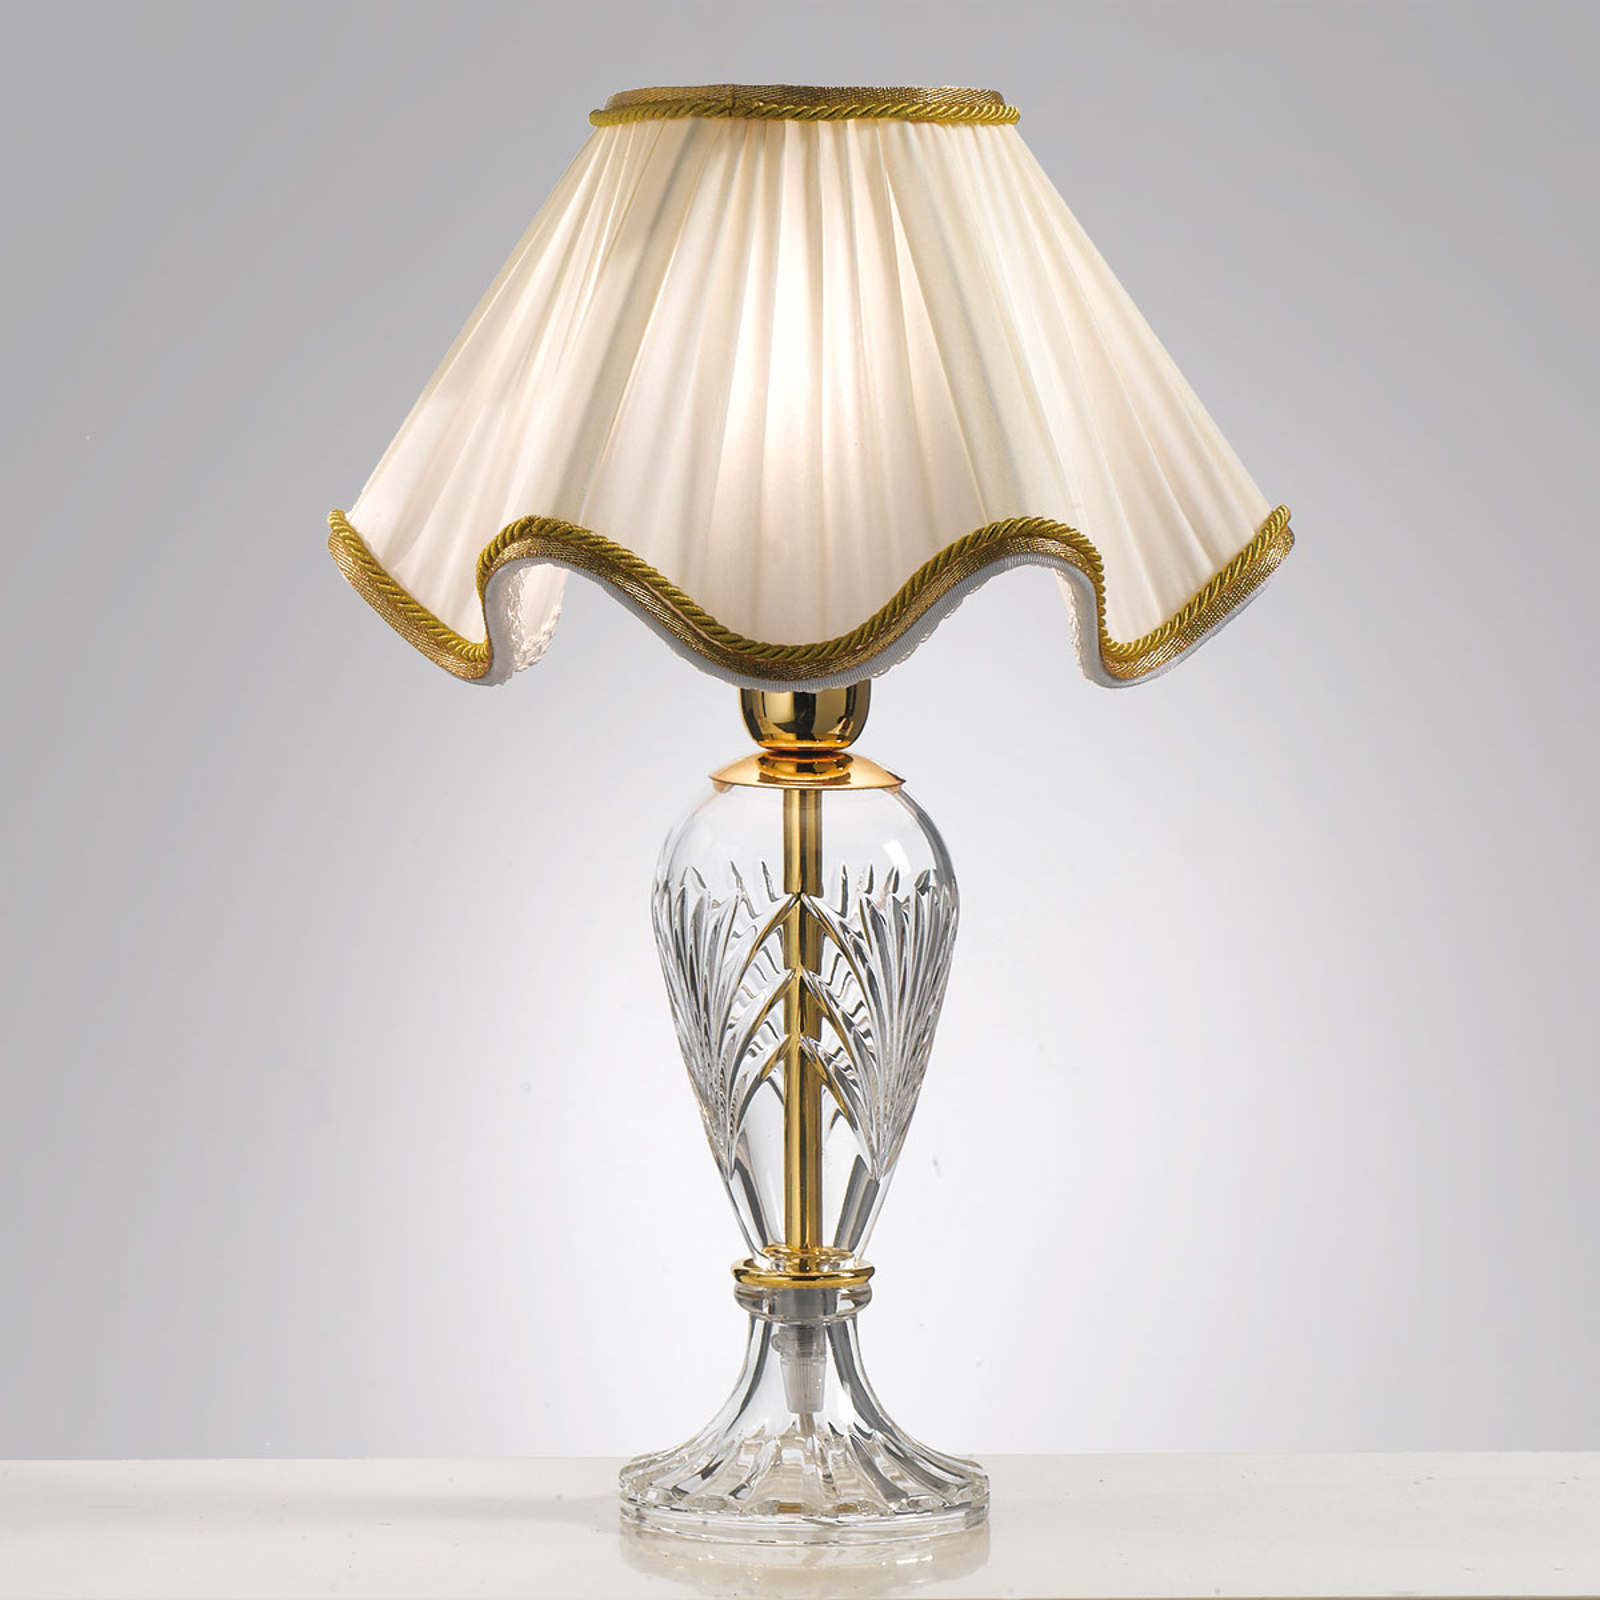 Prachtige tafellamp Belle Epoque, 48 cm